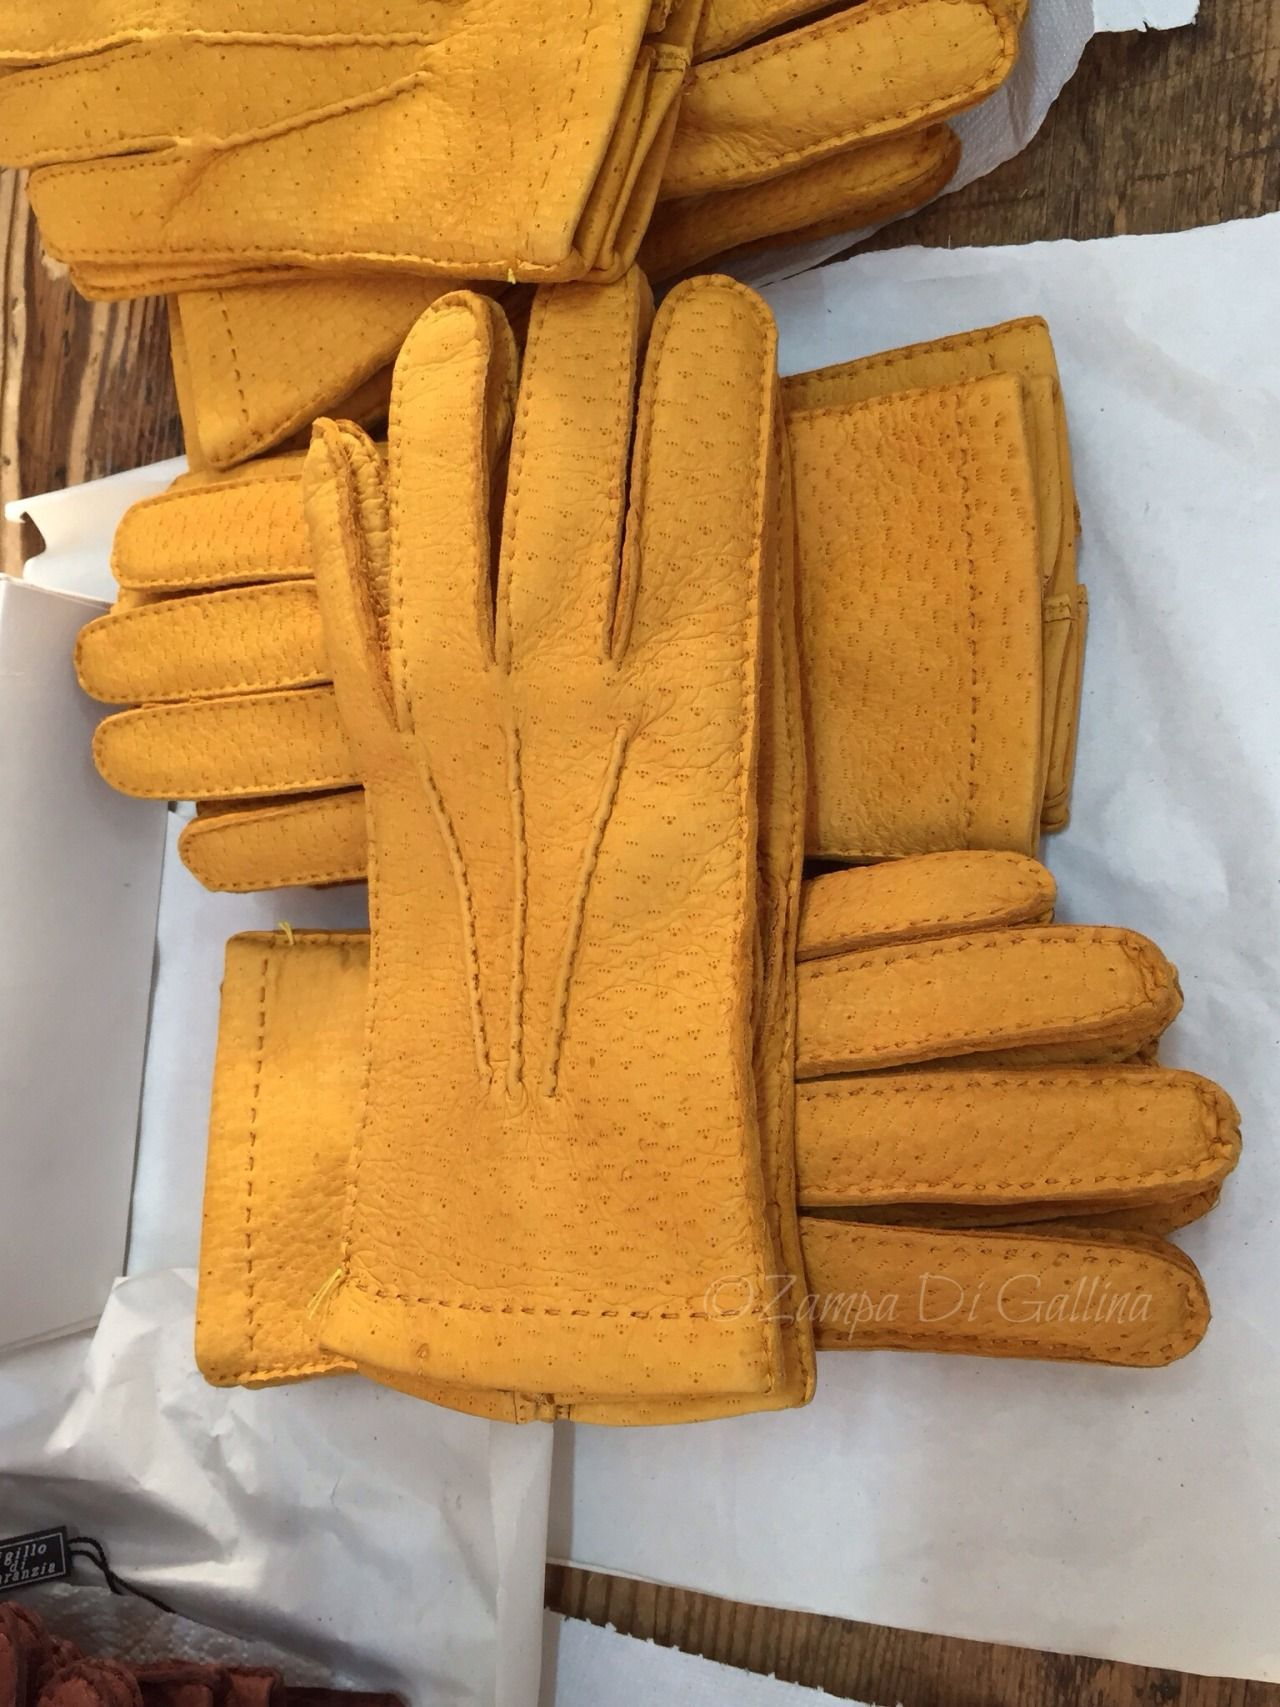 "zampa-di-gallina: "" At the end of the process, Mauro checks every glove individually. """